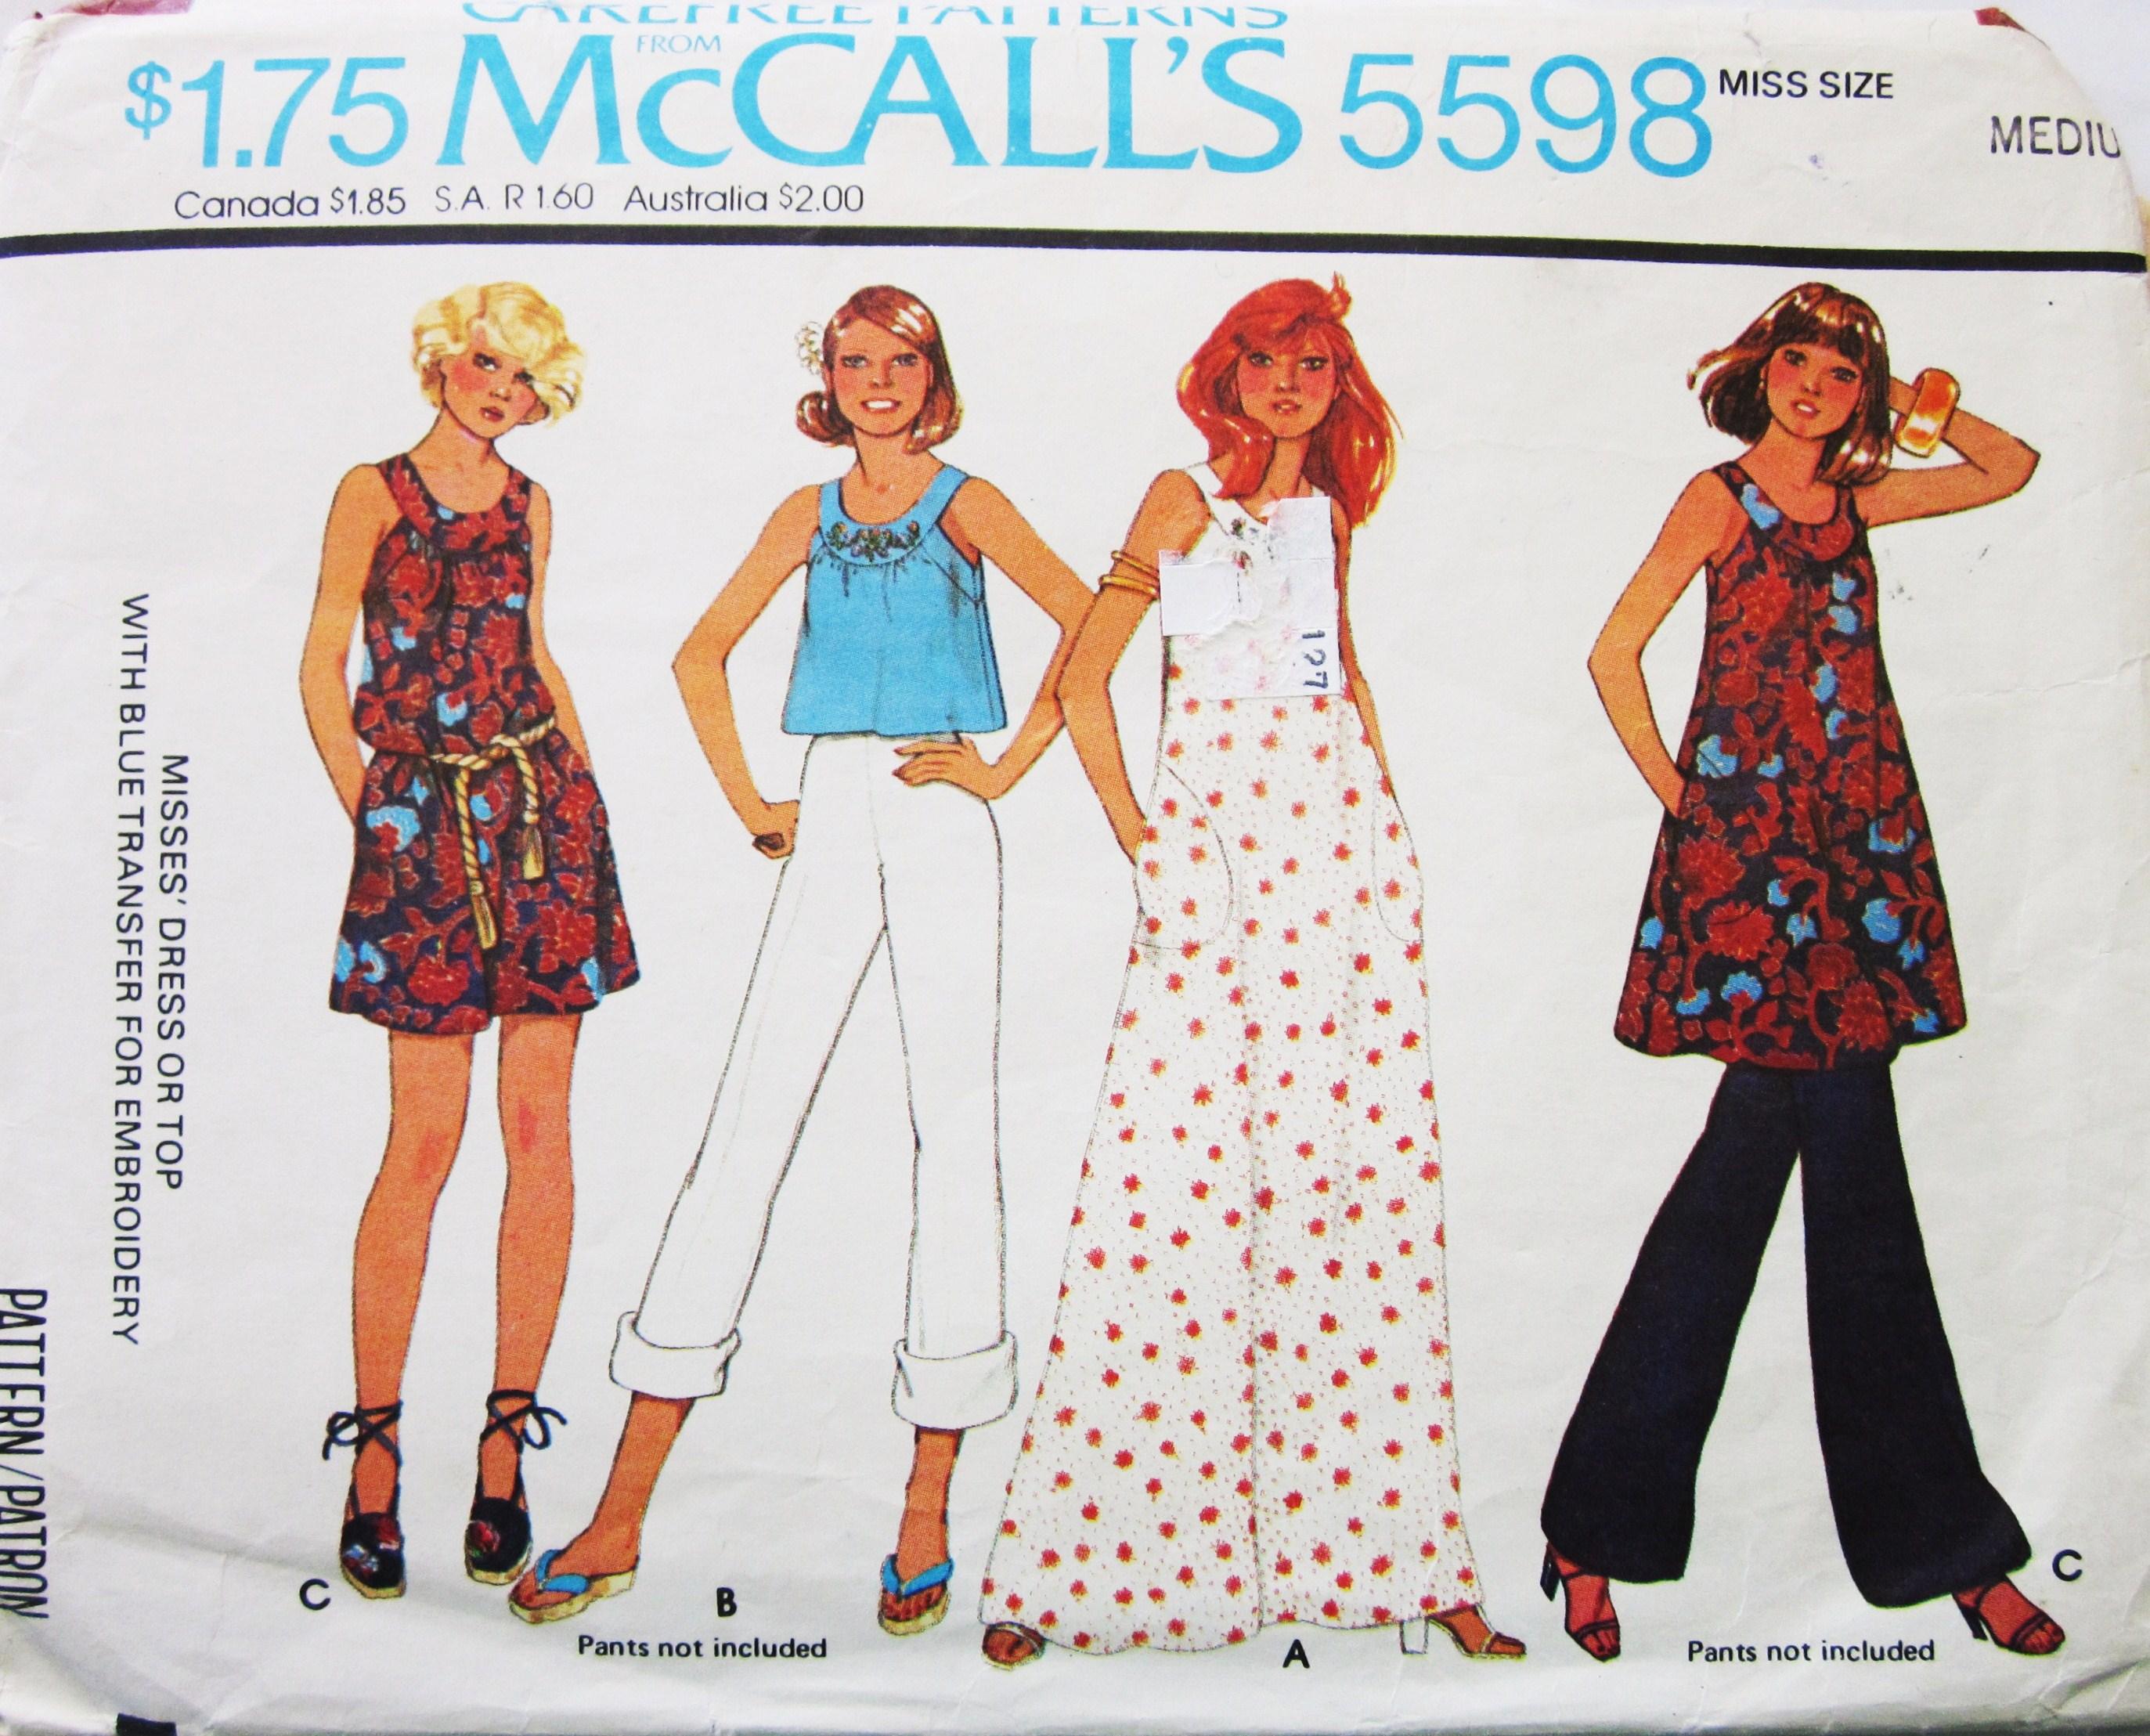 McCall's 5598 A